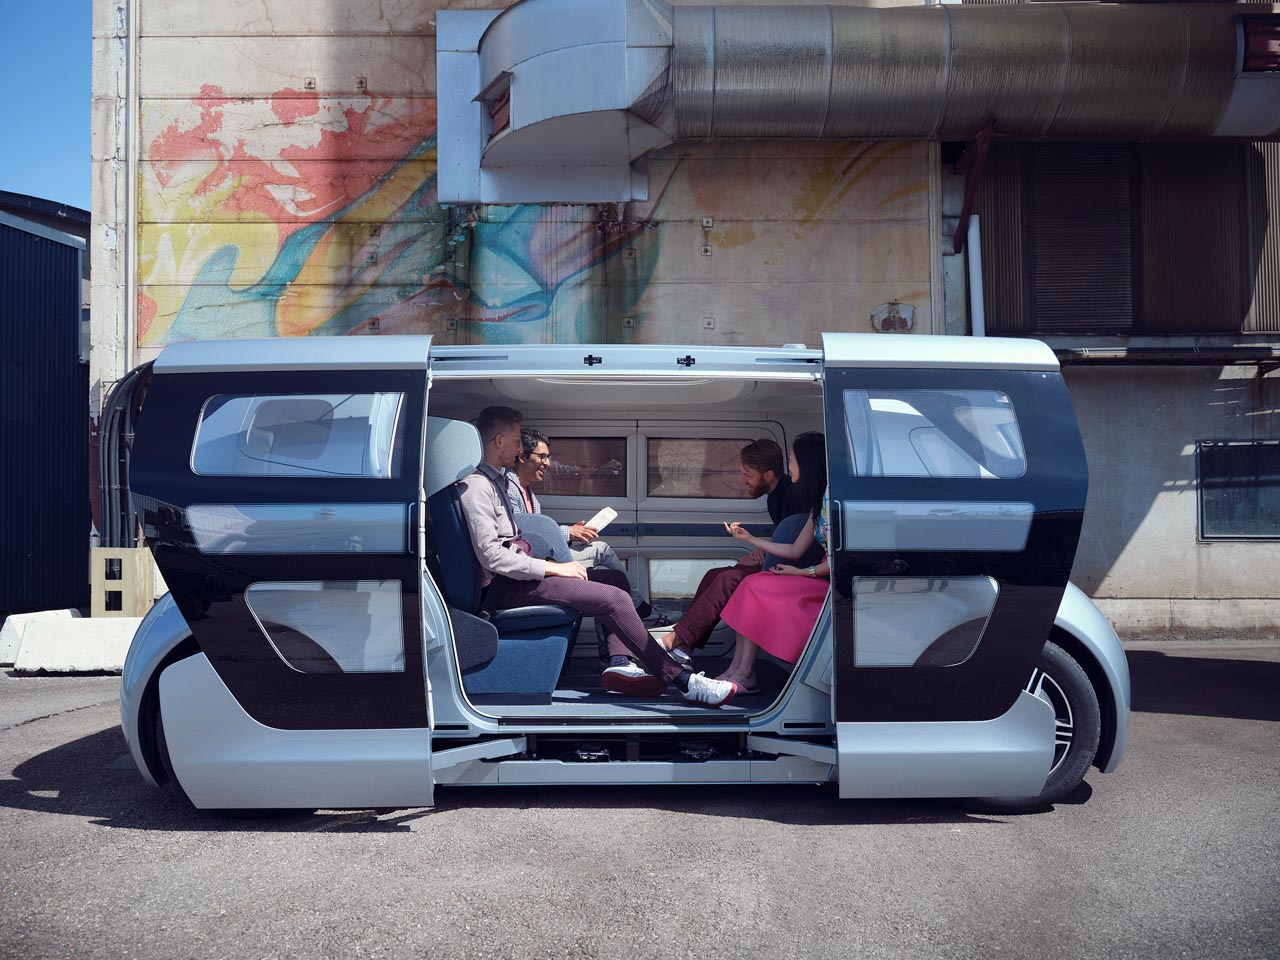 NEVS: Carsharing-Konzept für Selbstfahr-Shuttle